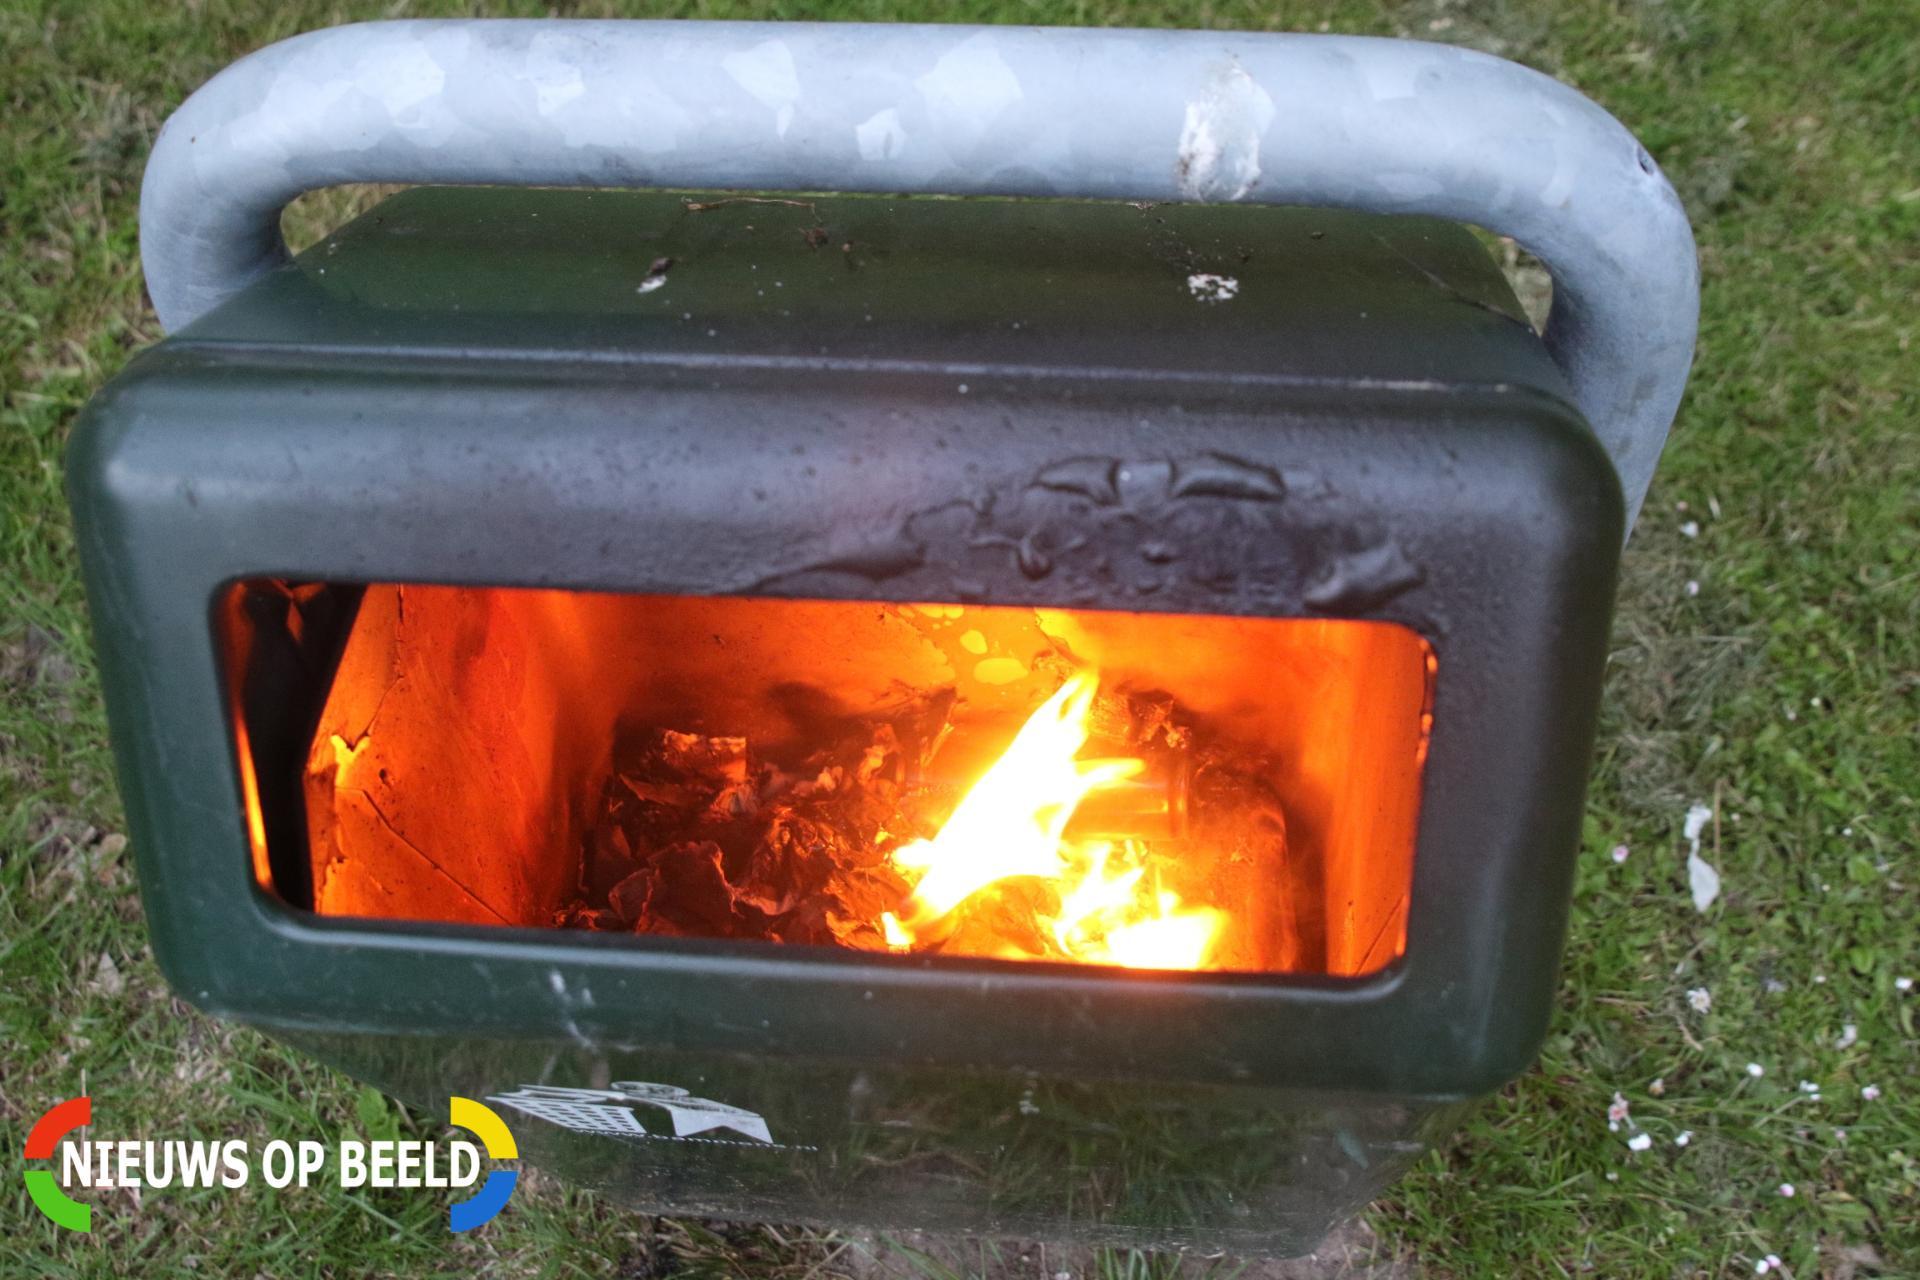 Brandweer blust brandje in prullenbak Bloemerd Leiderdorp